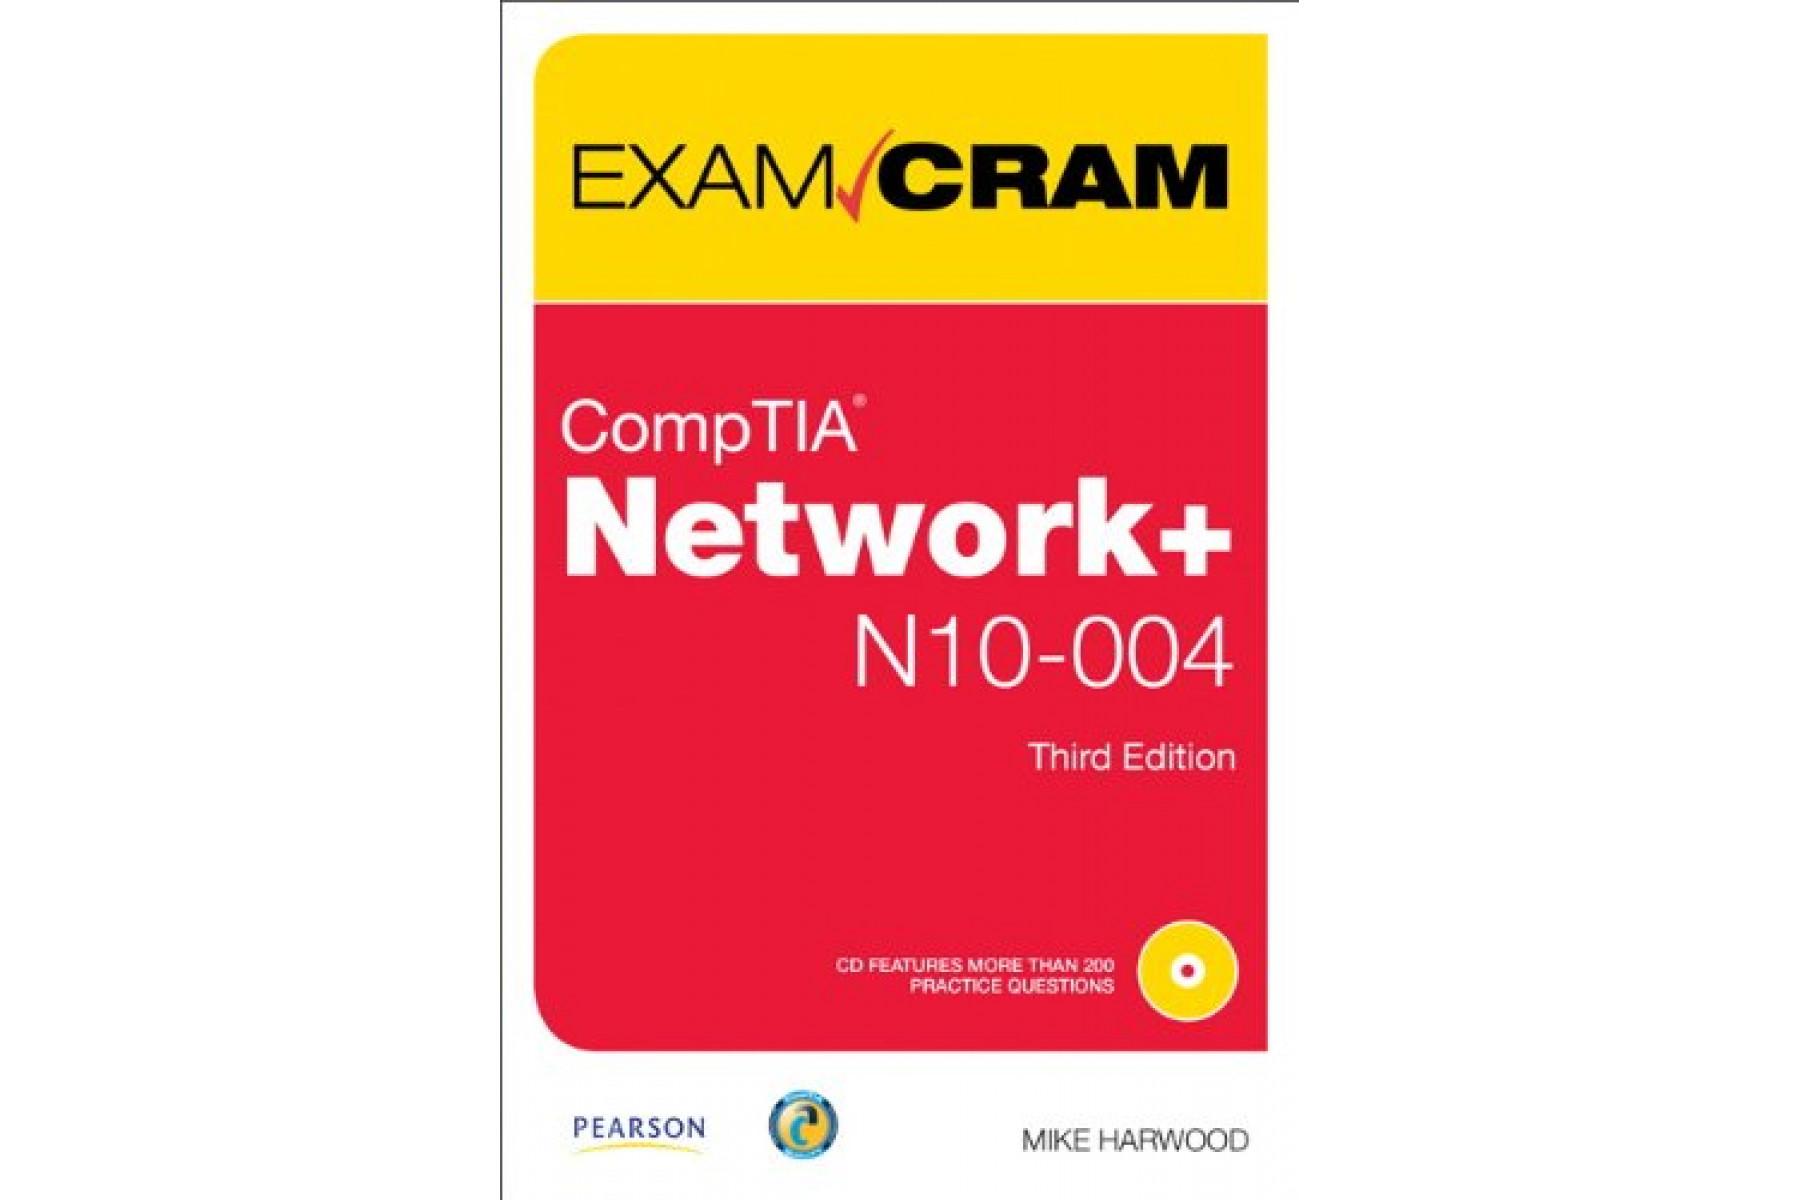 CompTIA Network+ N10-004 Exam Cram (Exam Cram (Pearson))